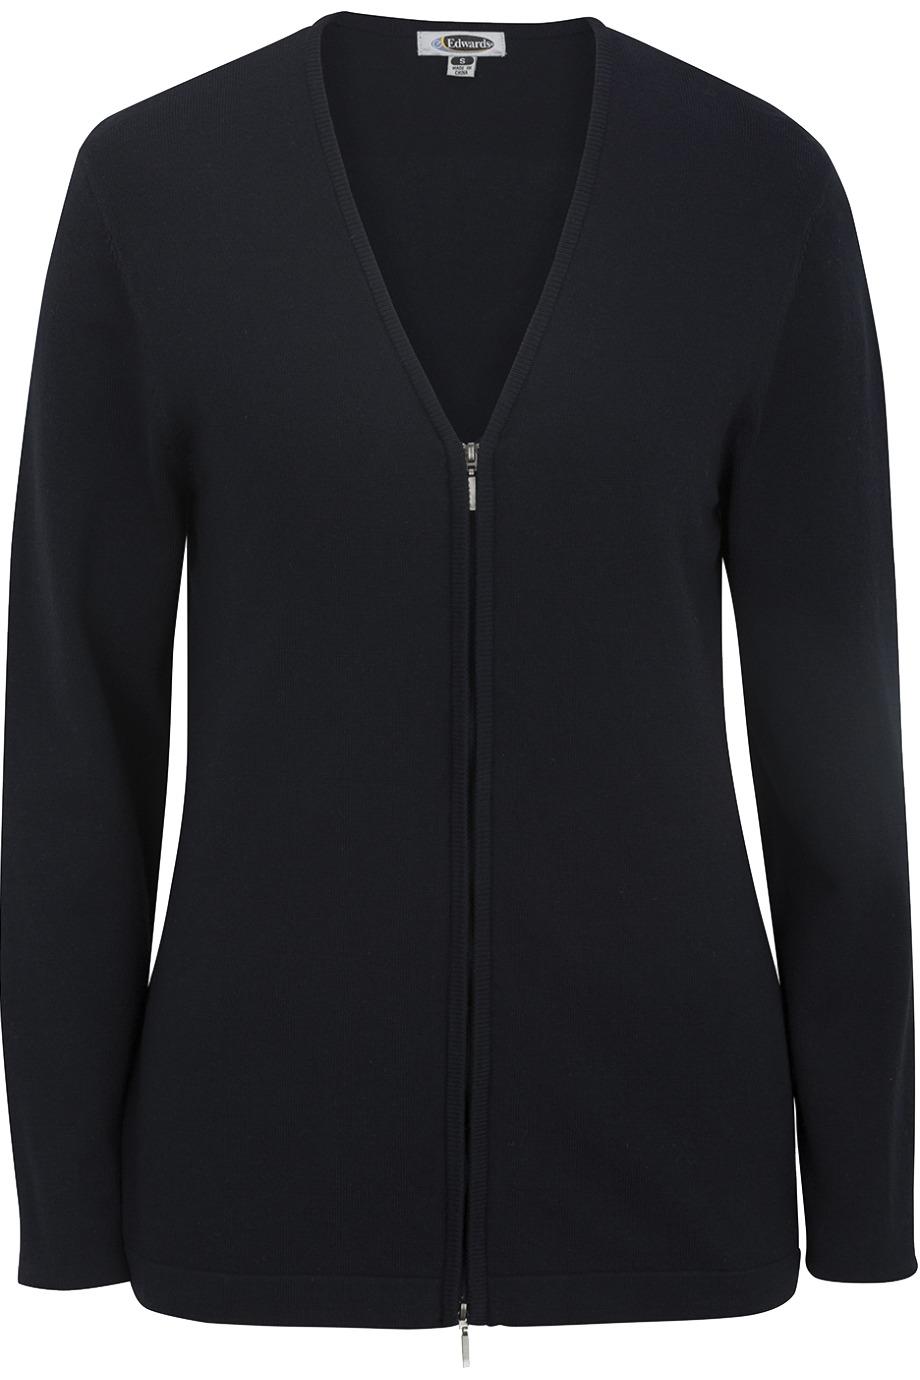 Edwards Garment 7062 - Ladies' V-Neck Cardigan